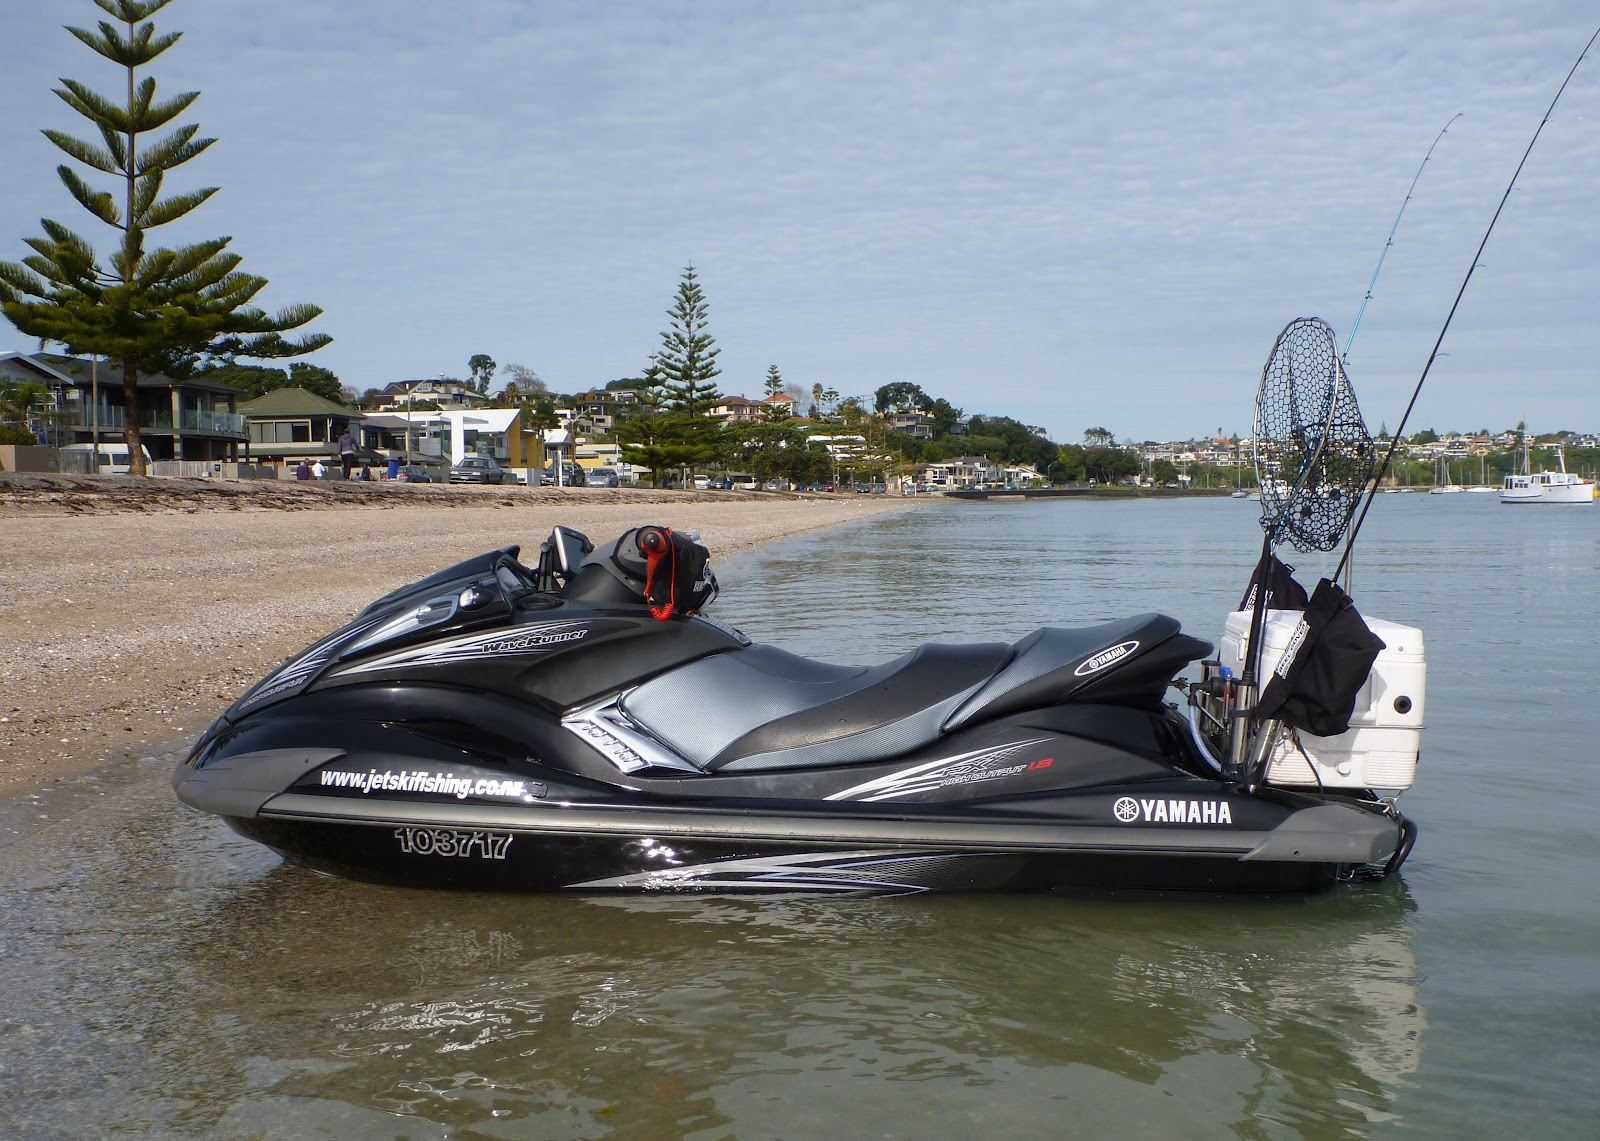 Jet ski fishing blog report 082 the reward of winter for Fishing jet ski